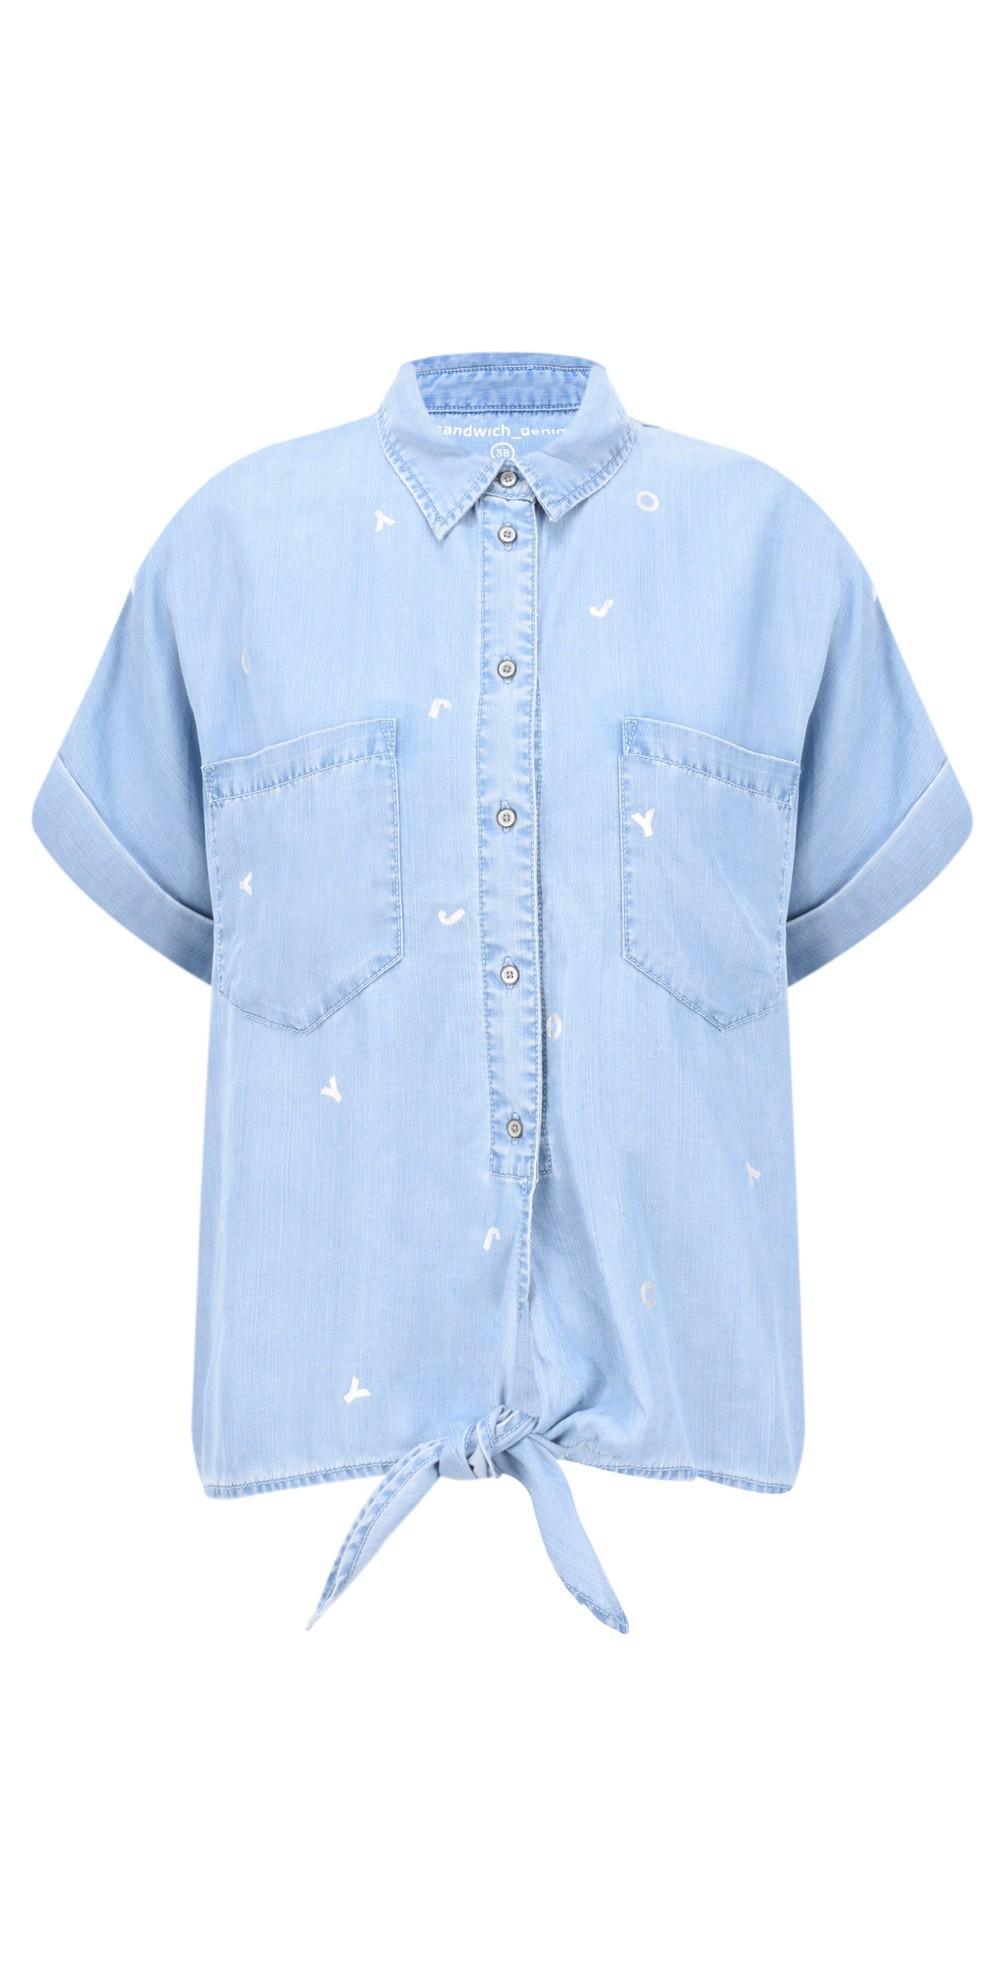 85e45bd605 Sandwich Clothing Denim Tie Waist Joy Blouse in Light Blue Denim